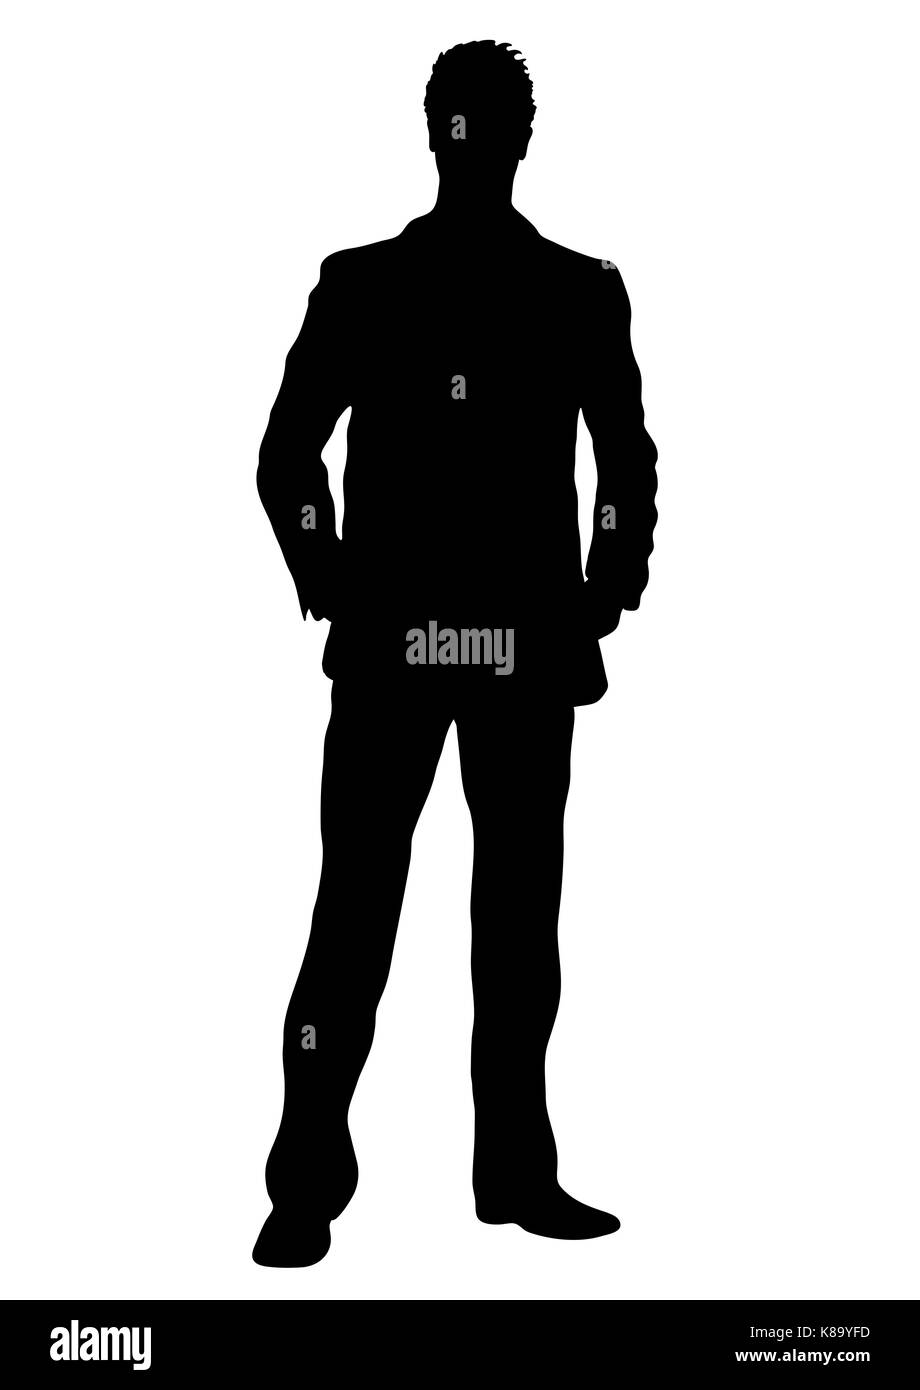 Human Body Outline Stockfotos & Human Body Outline Bilder - Alamy